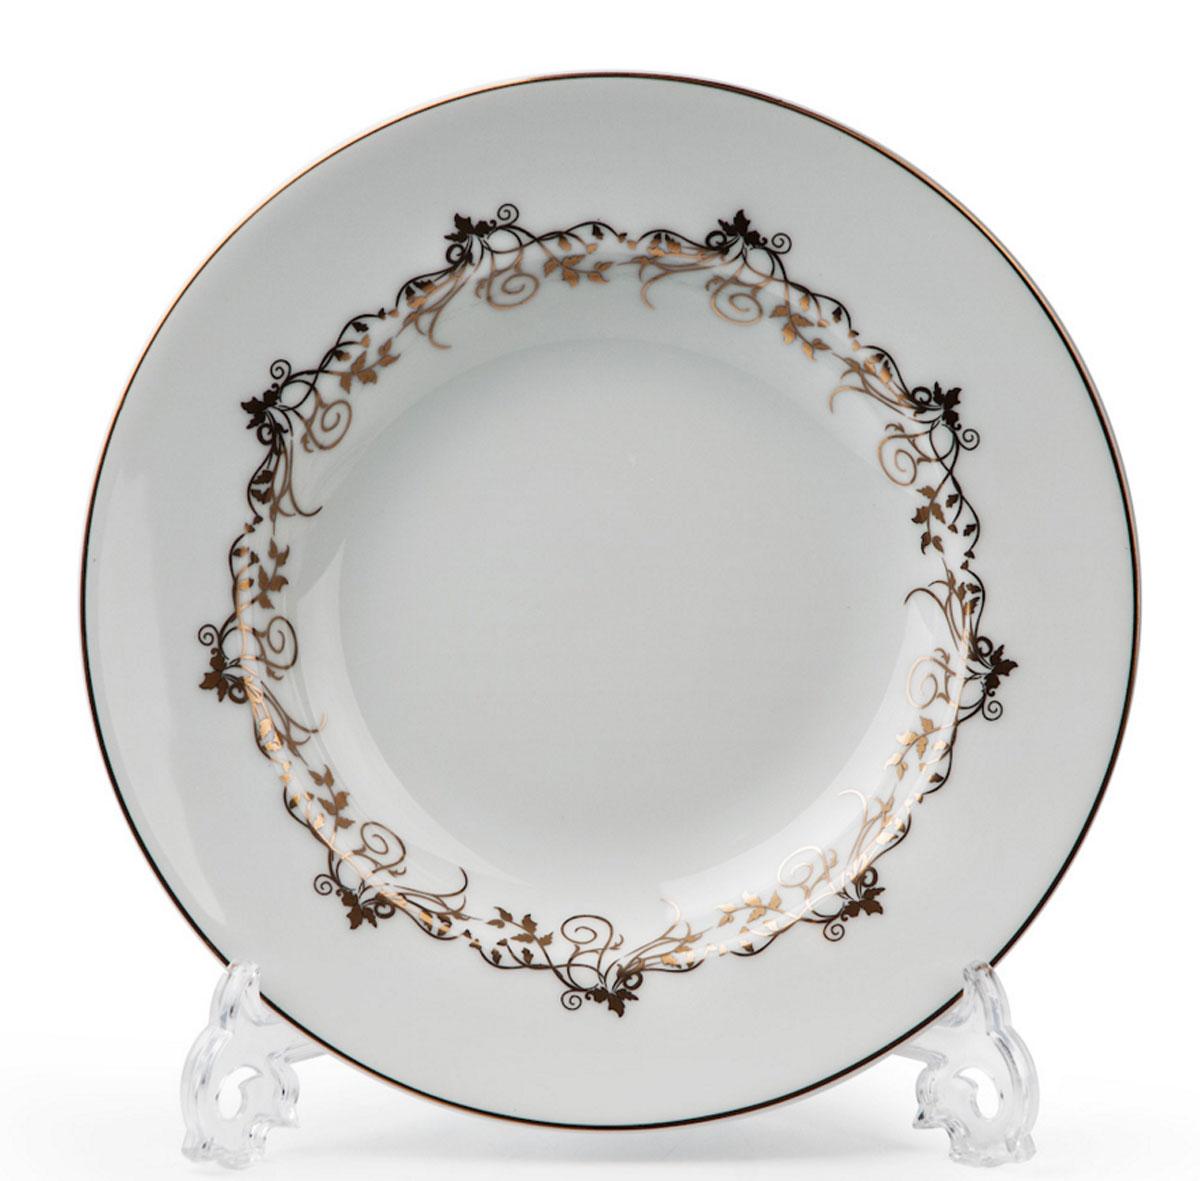 Mimosa Lierre Or 947, набор тарелок глубоких (6шт), цвет: белый с золотом54 009312В наборе глубокая тарелка 6 штук Материал: фарфор: цвет: белый с золотомСерия: MIMOSA